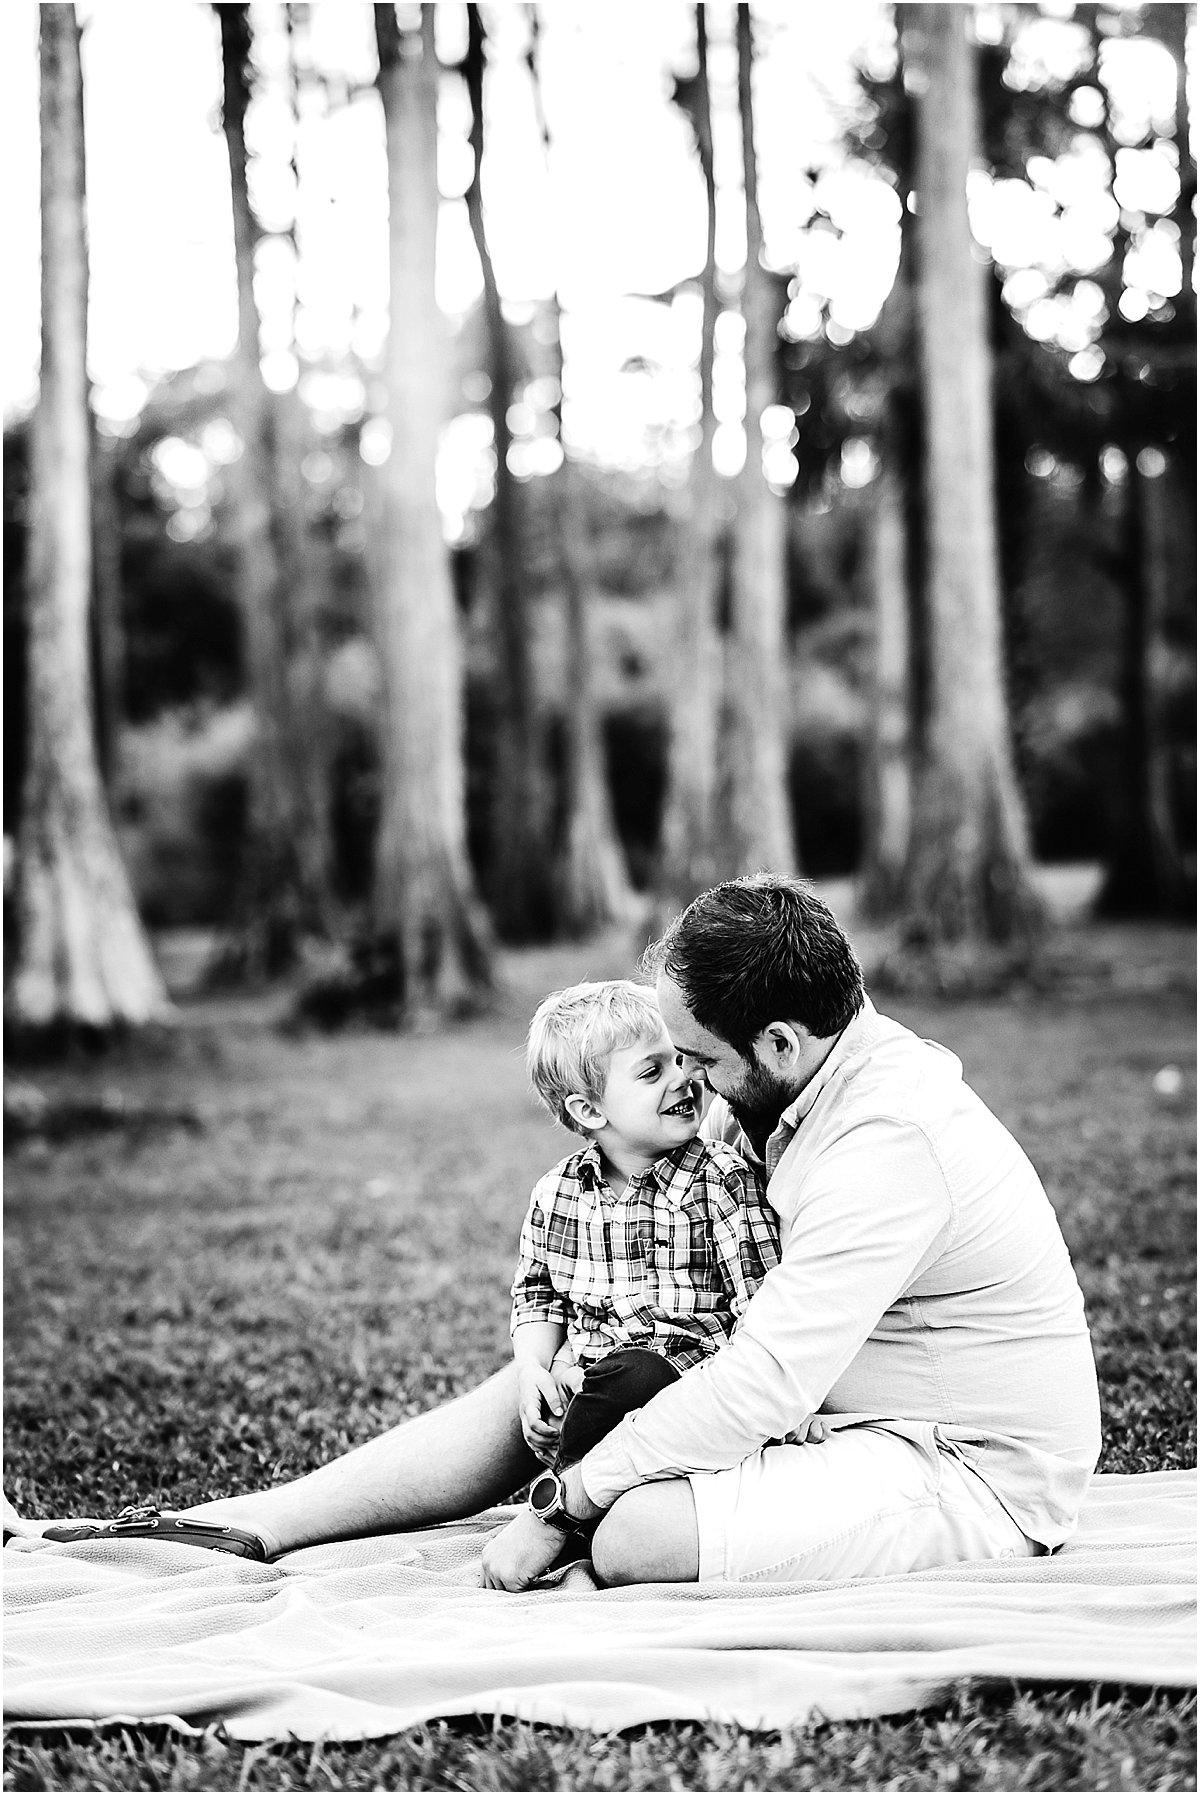 Ashley_Rogers_Photography_South_Florida_Photographer_Orlando_Photographer_Costa_Rica_Photographer_2194.jpg